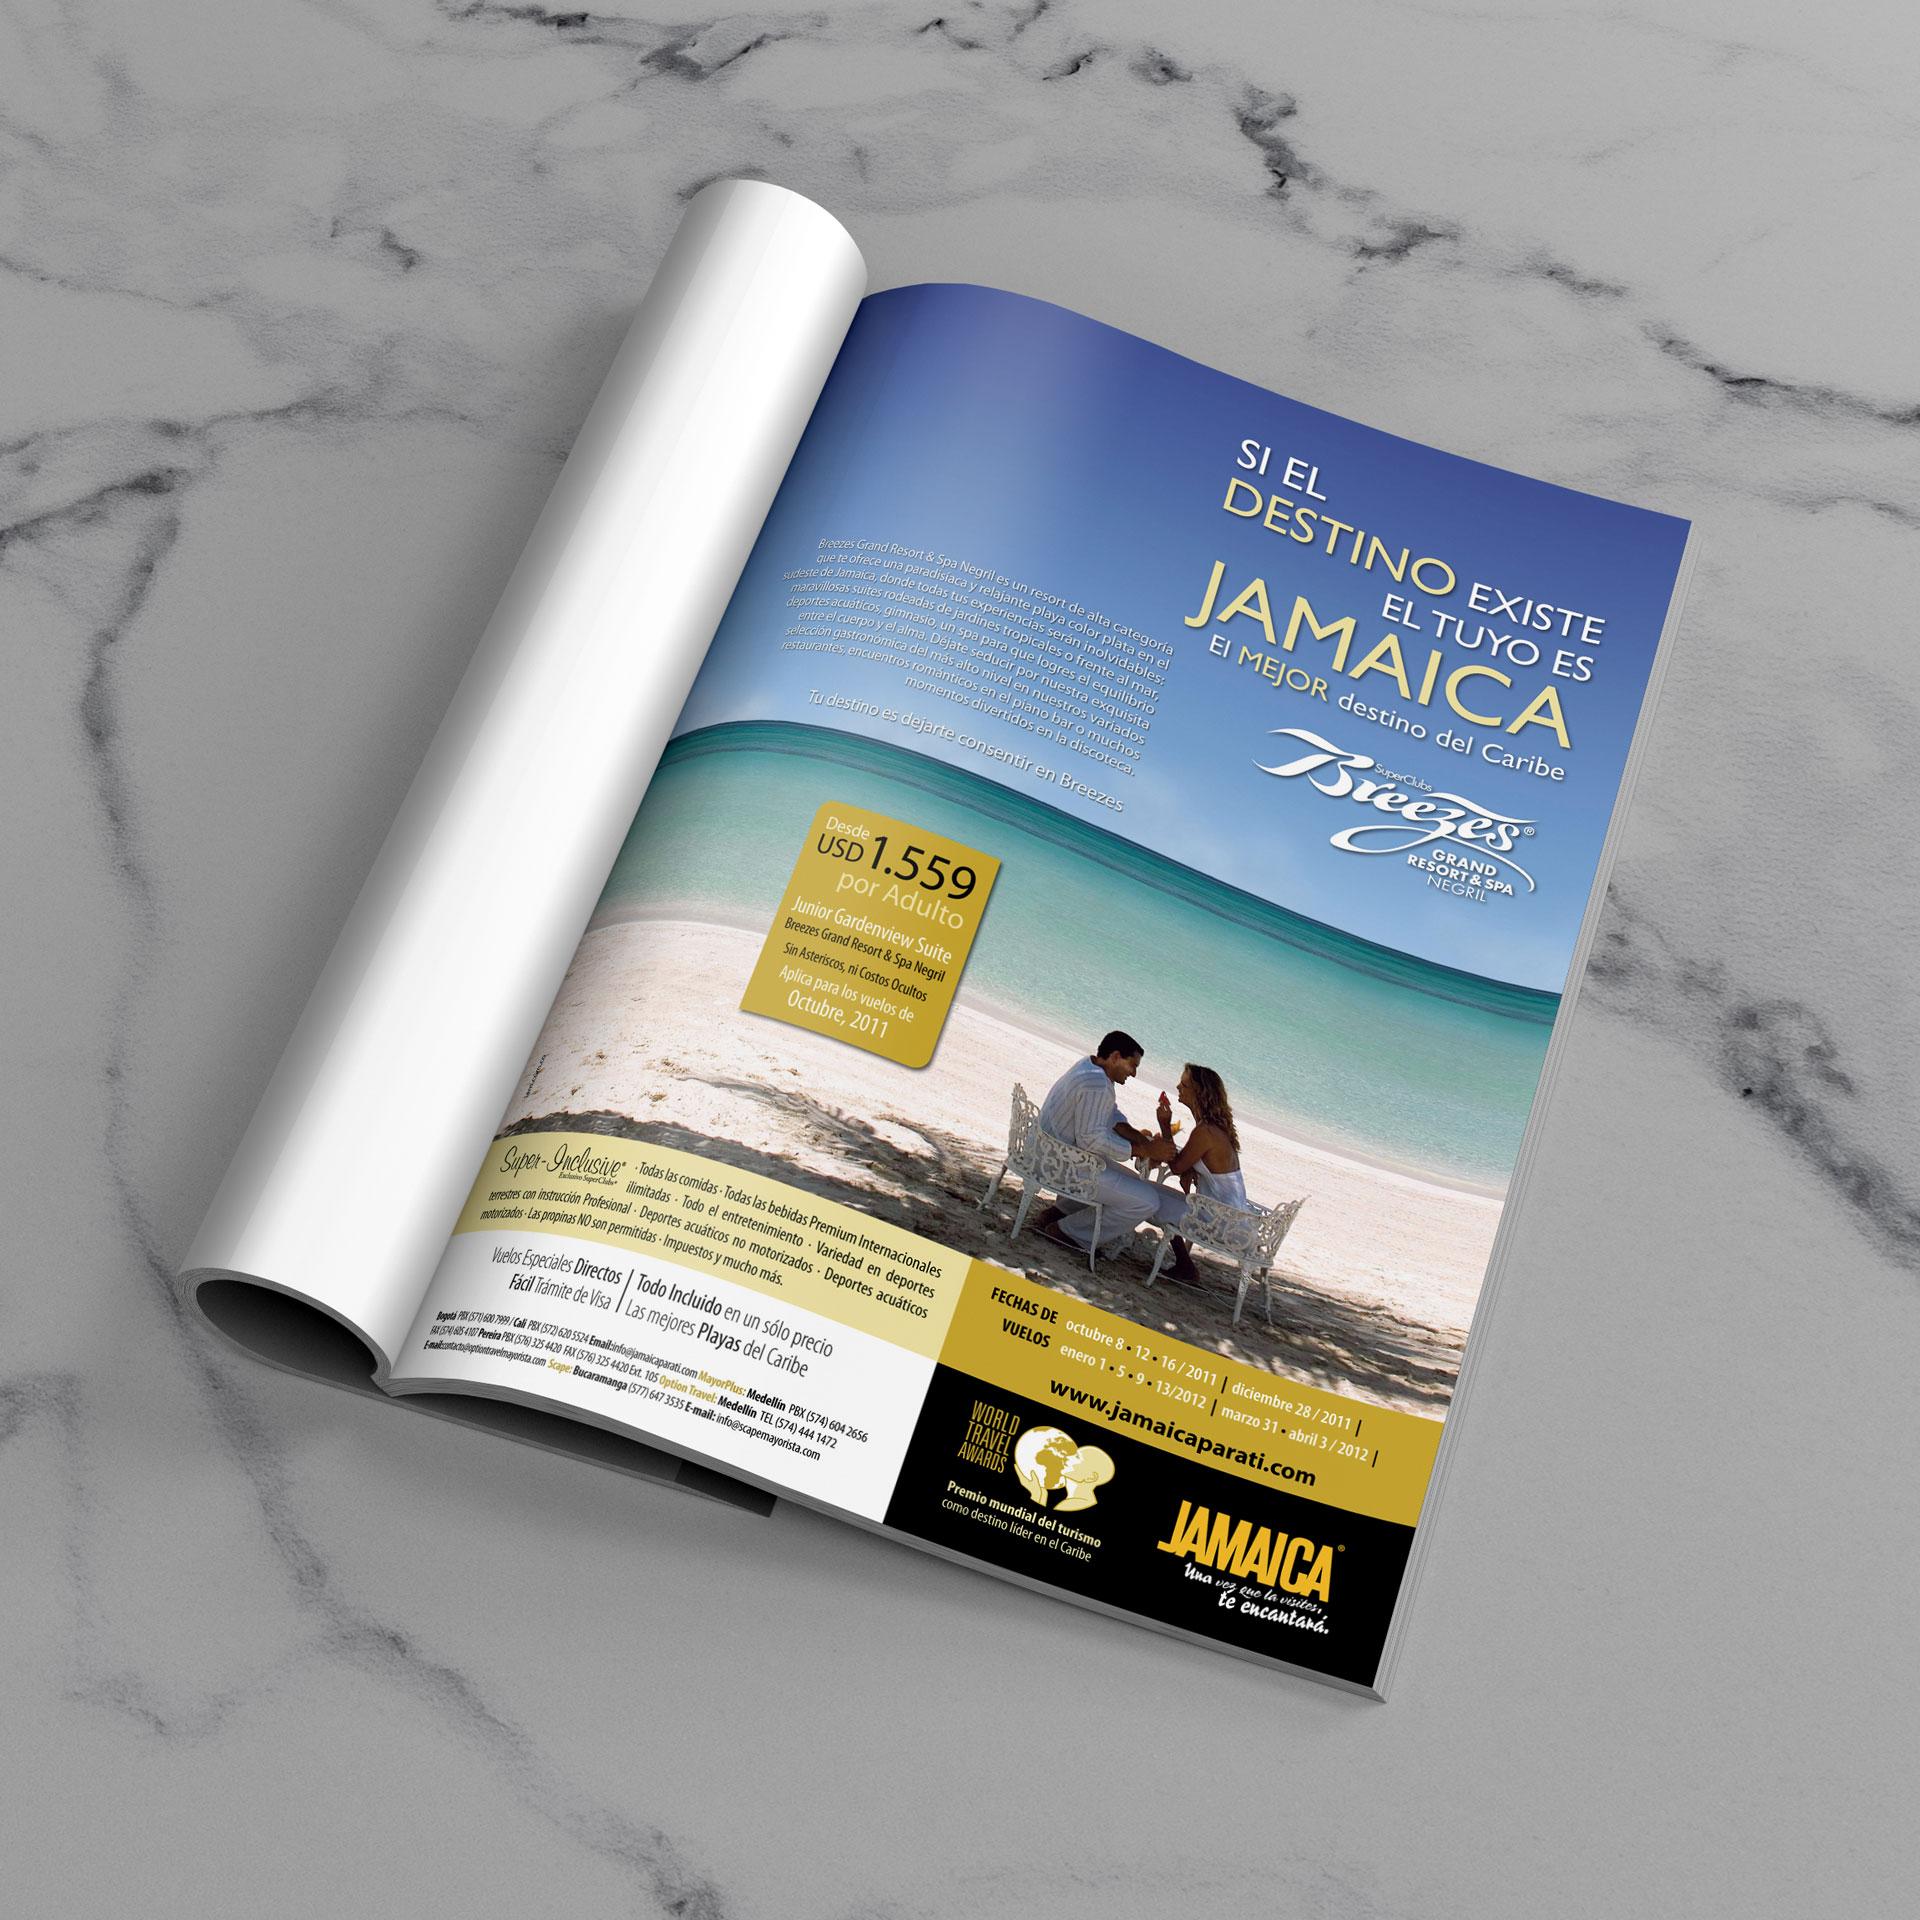 Campaña Breezes Grand Resort & Spa en Jamaica